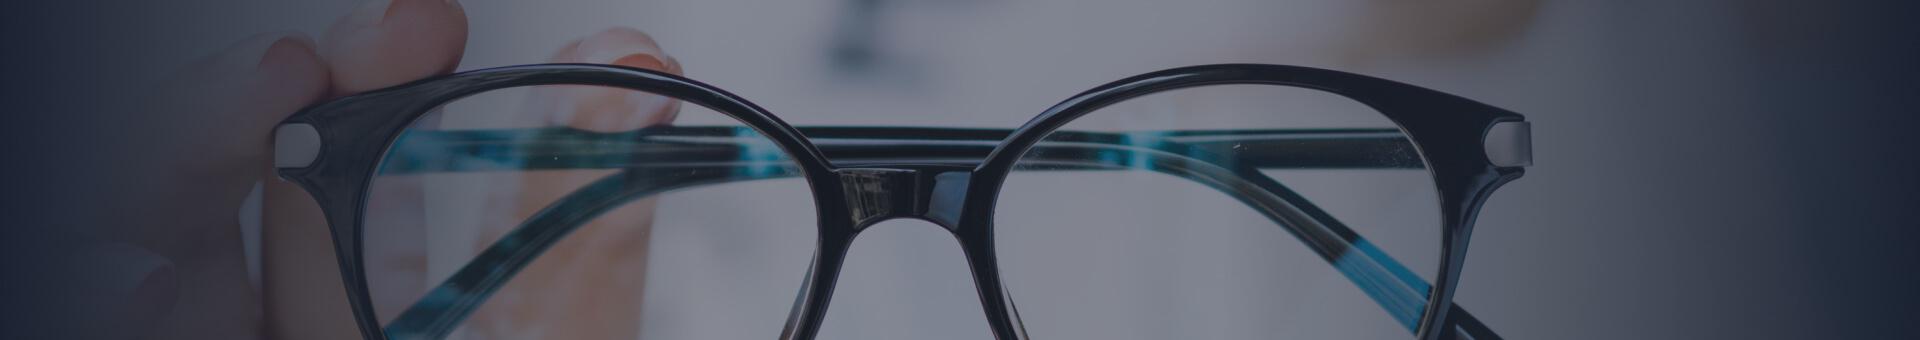 Wear Blue Light Blocking Glasses